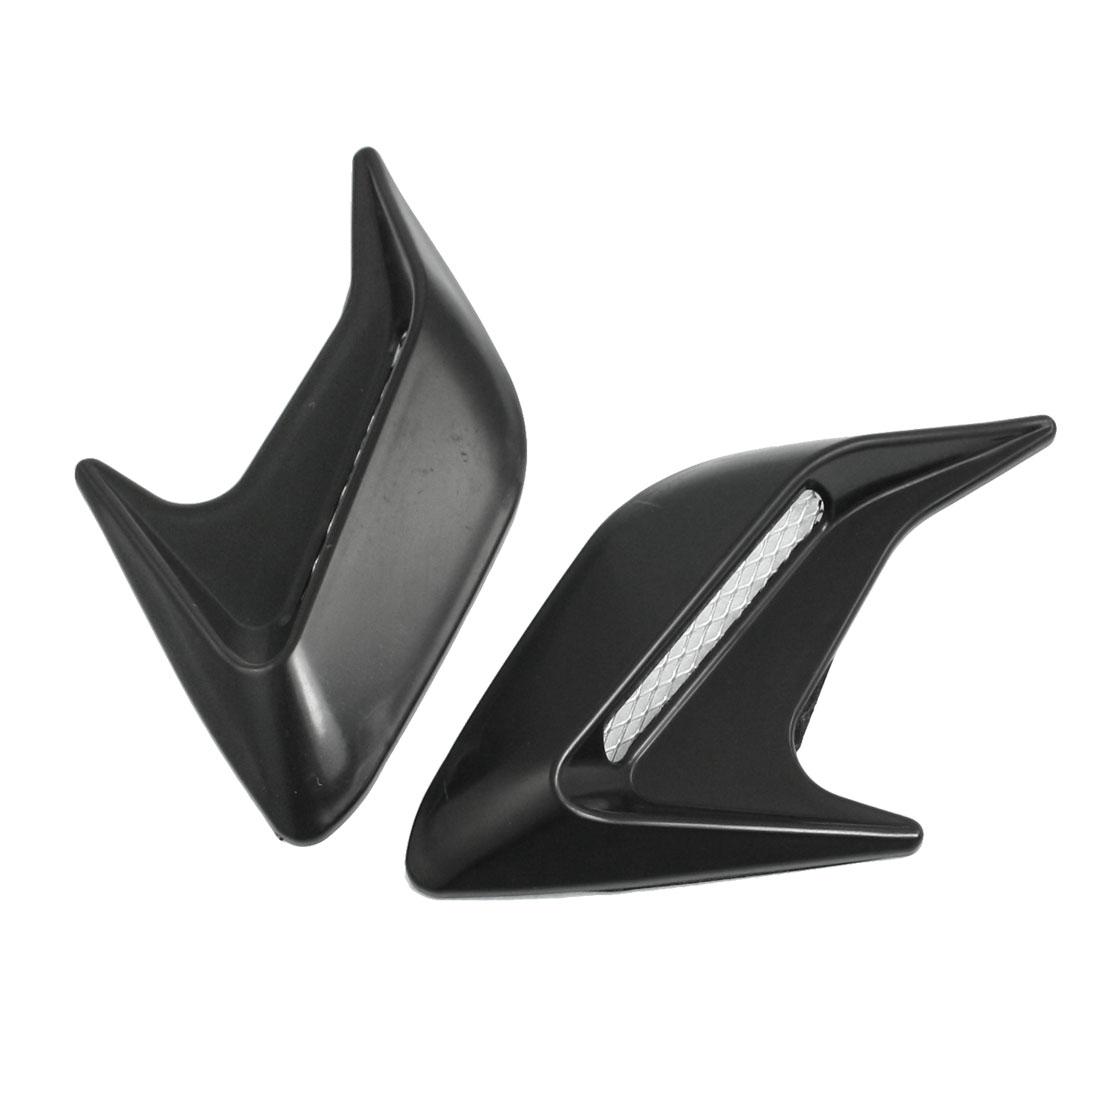 Car Auto Decorative Side Vent Air Flow Fender Intake Stickers Black 2 Pcs